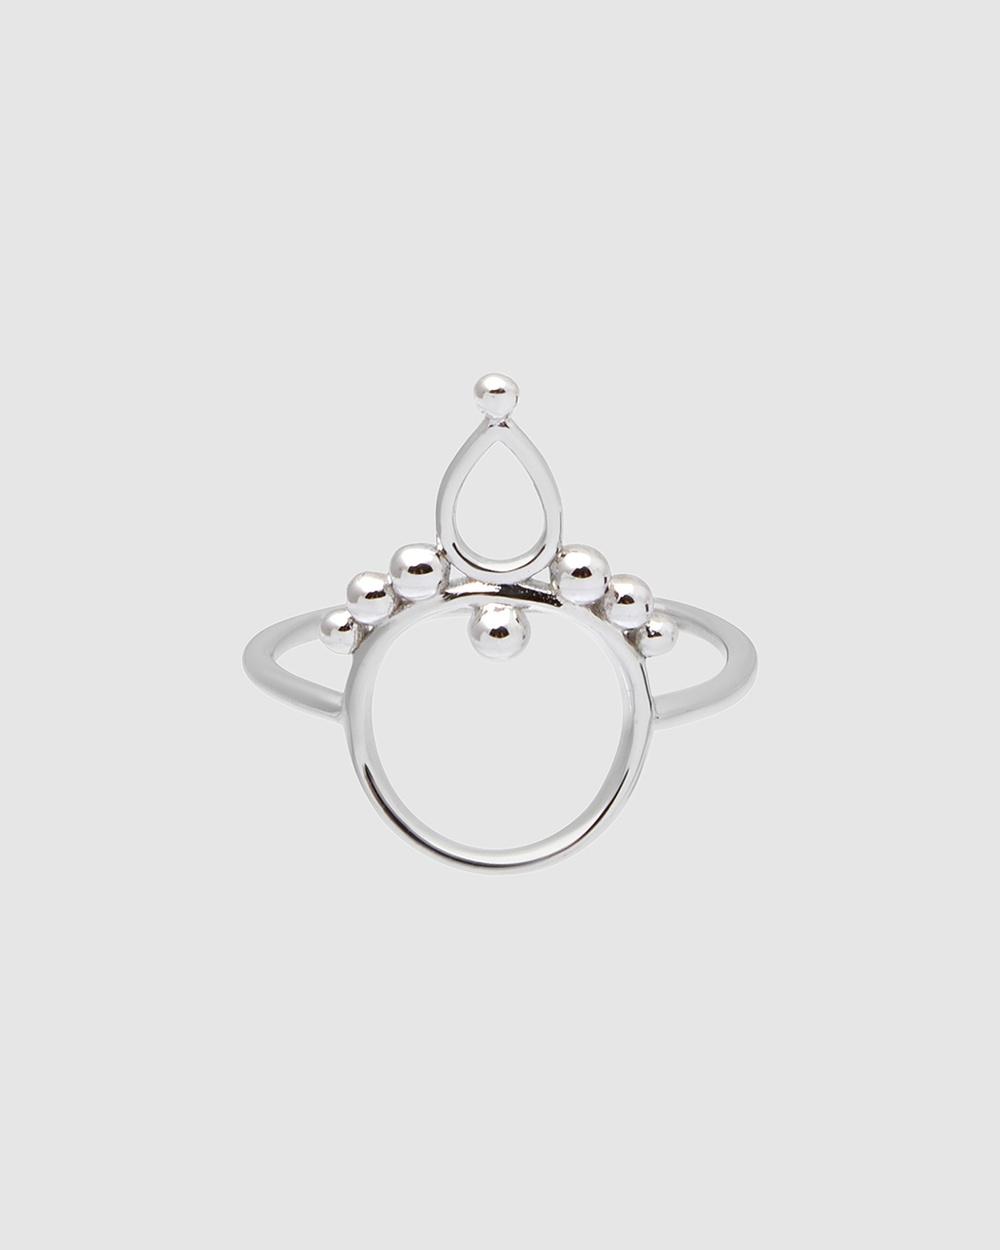 Pastiche Bamboo Ring Jewellery Silver